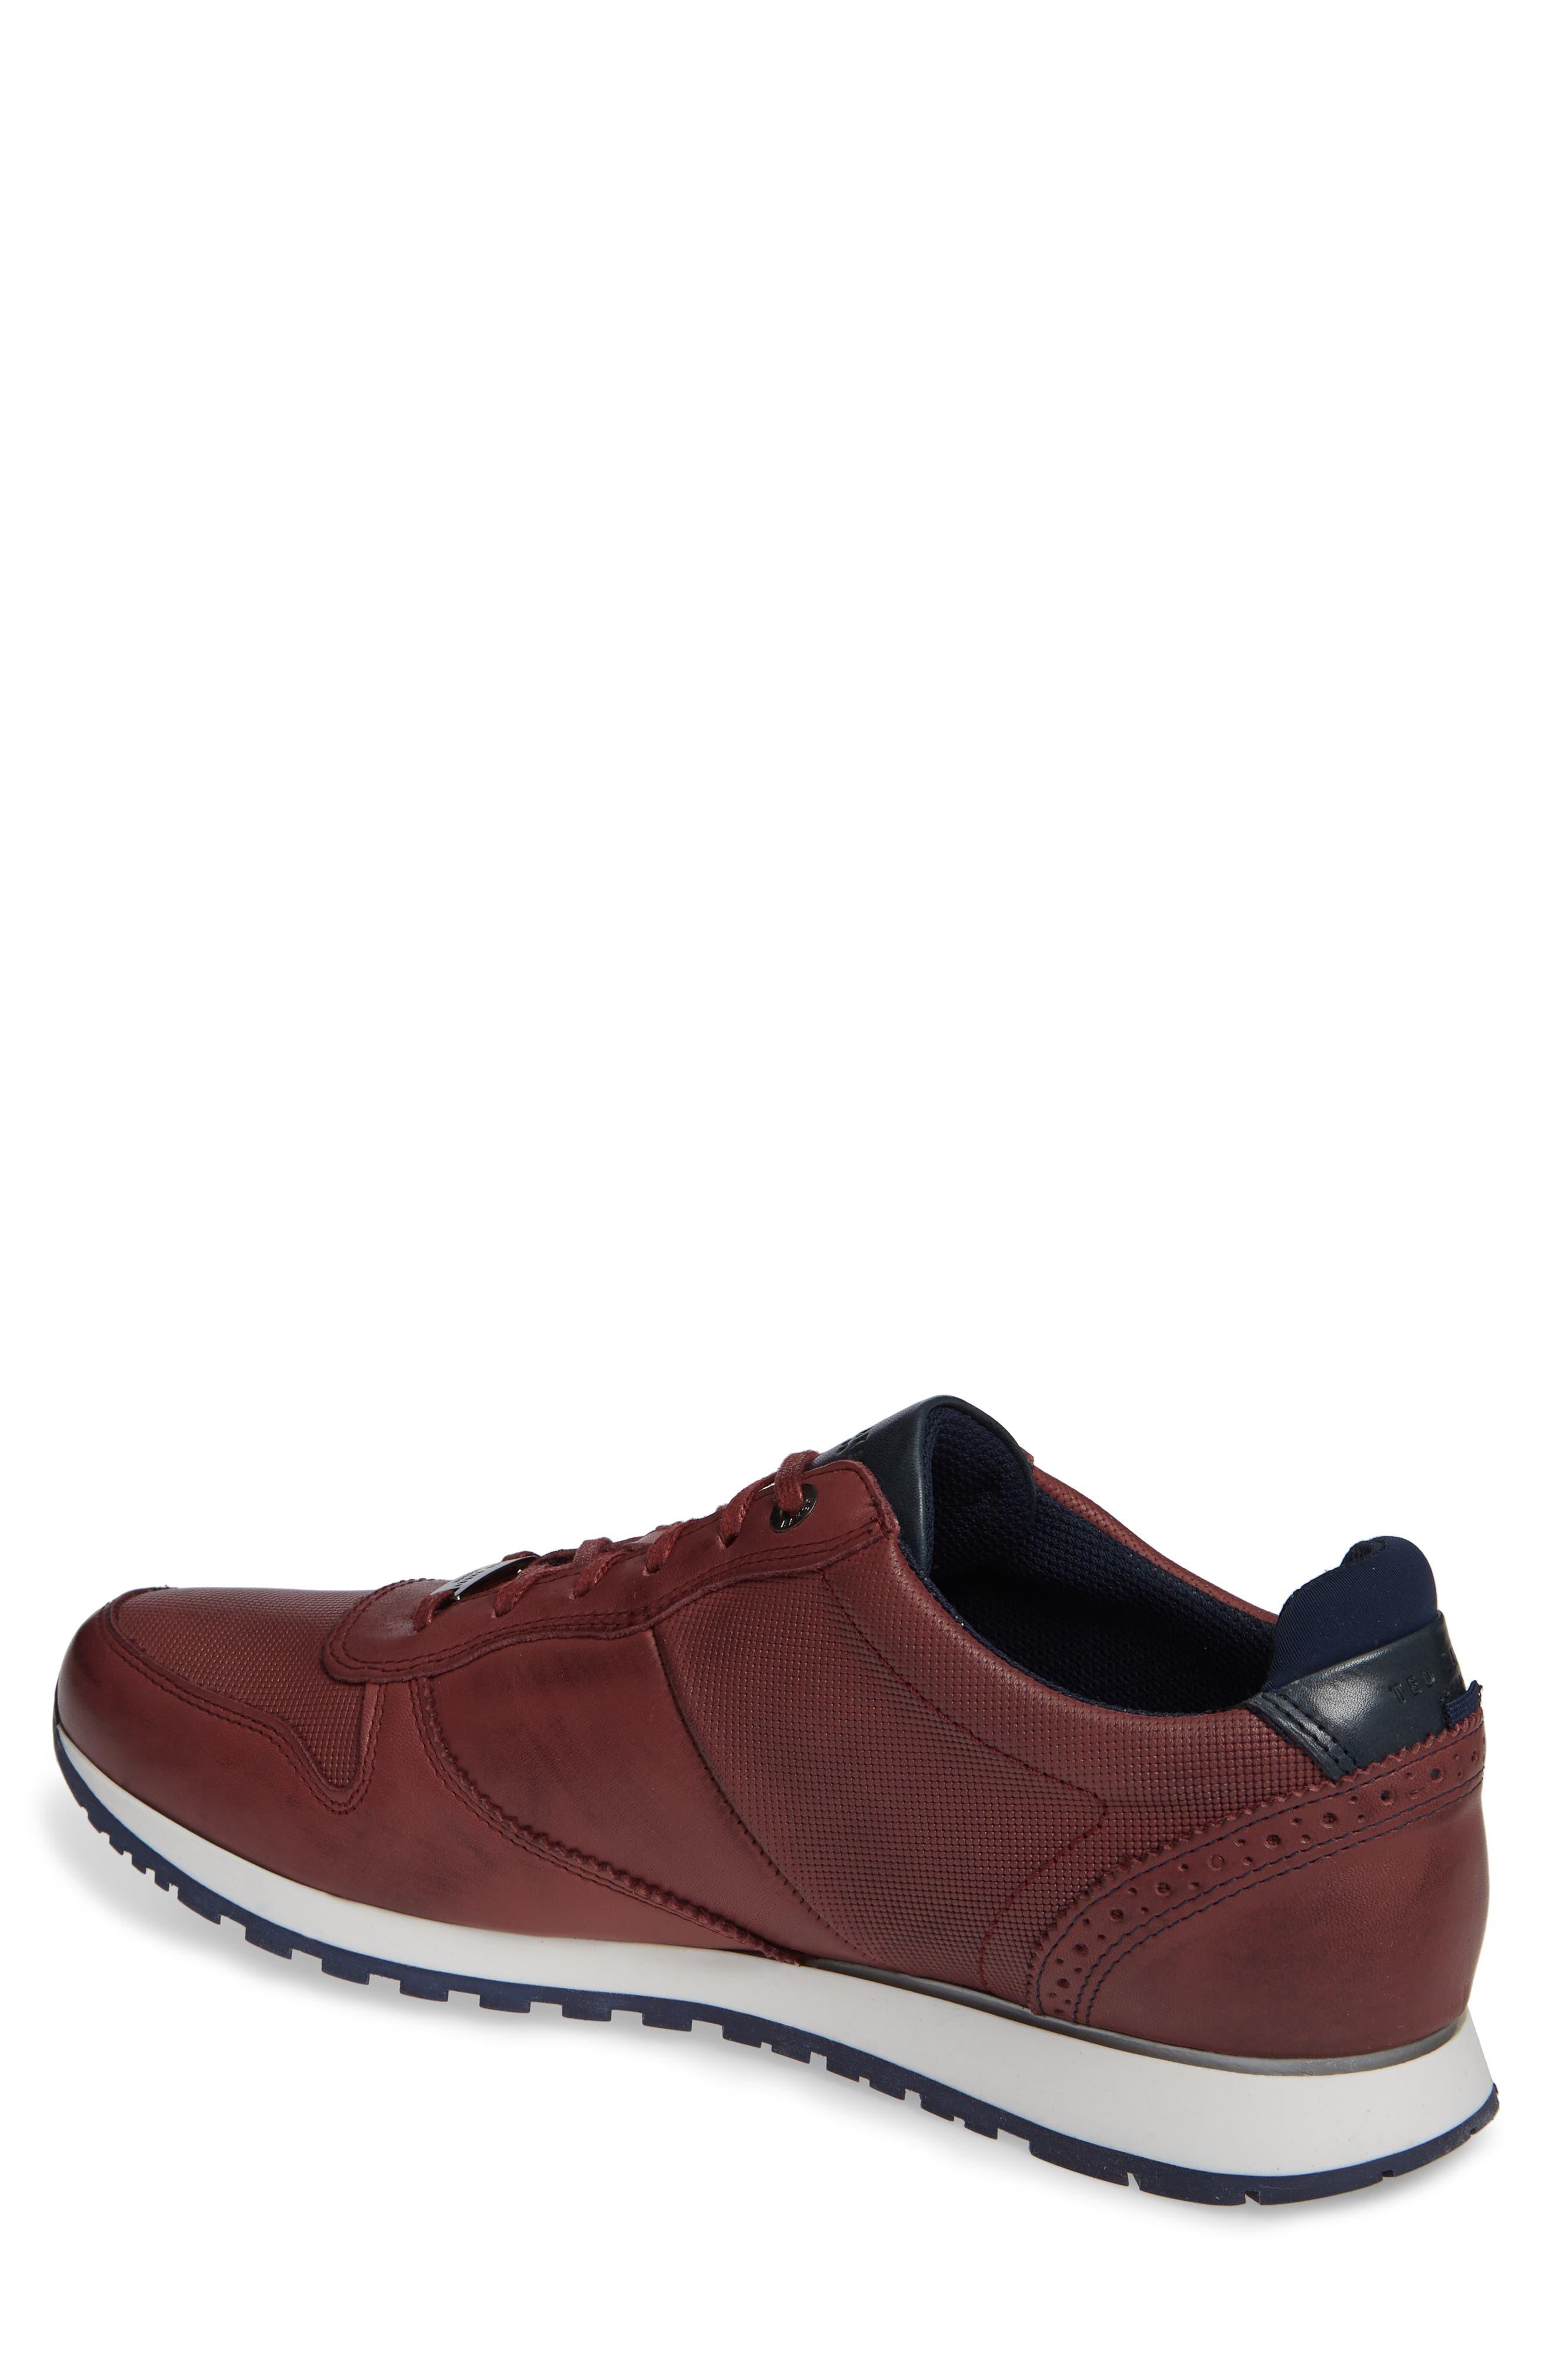 Shindl Sneaker,                             Alternate thumbnail 14, color,